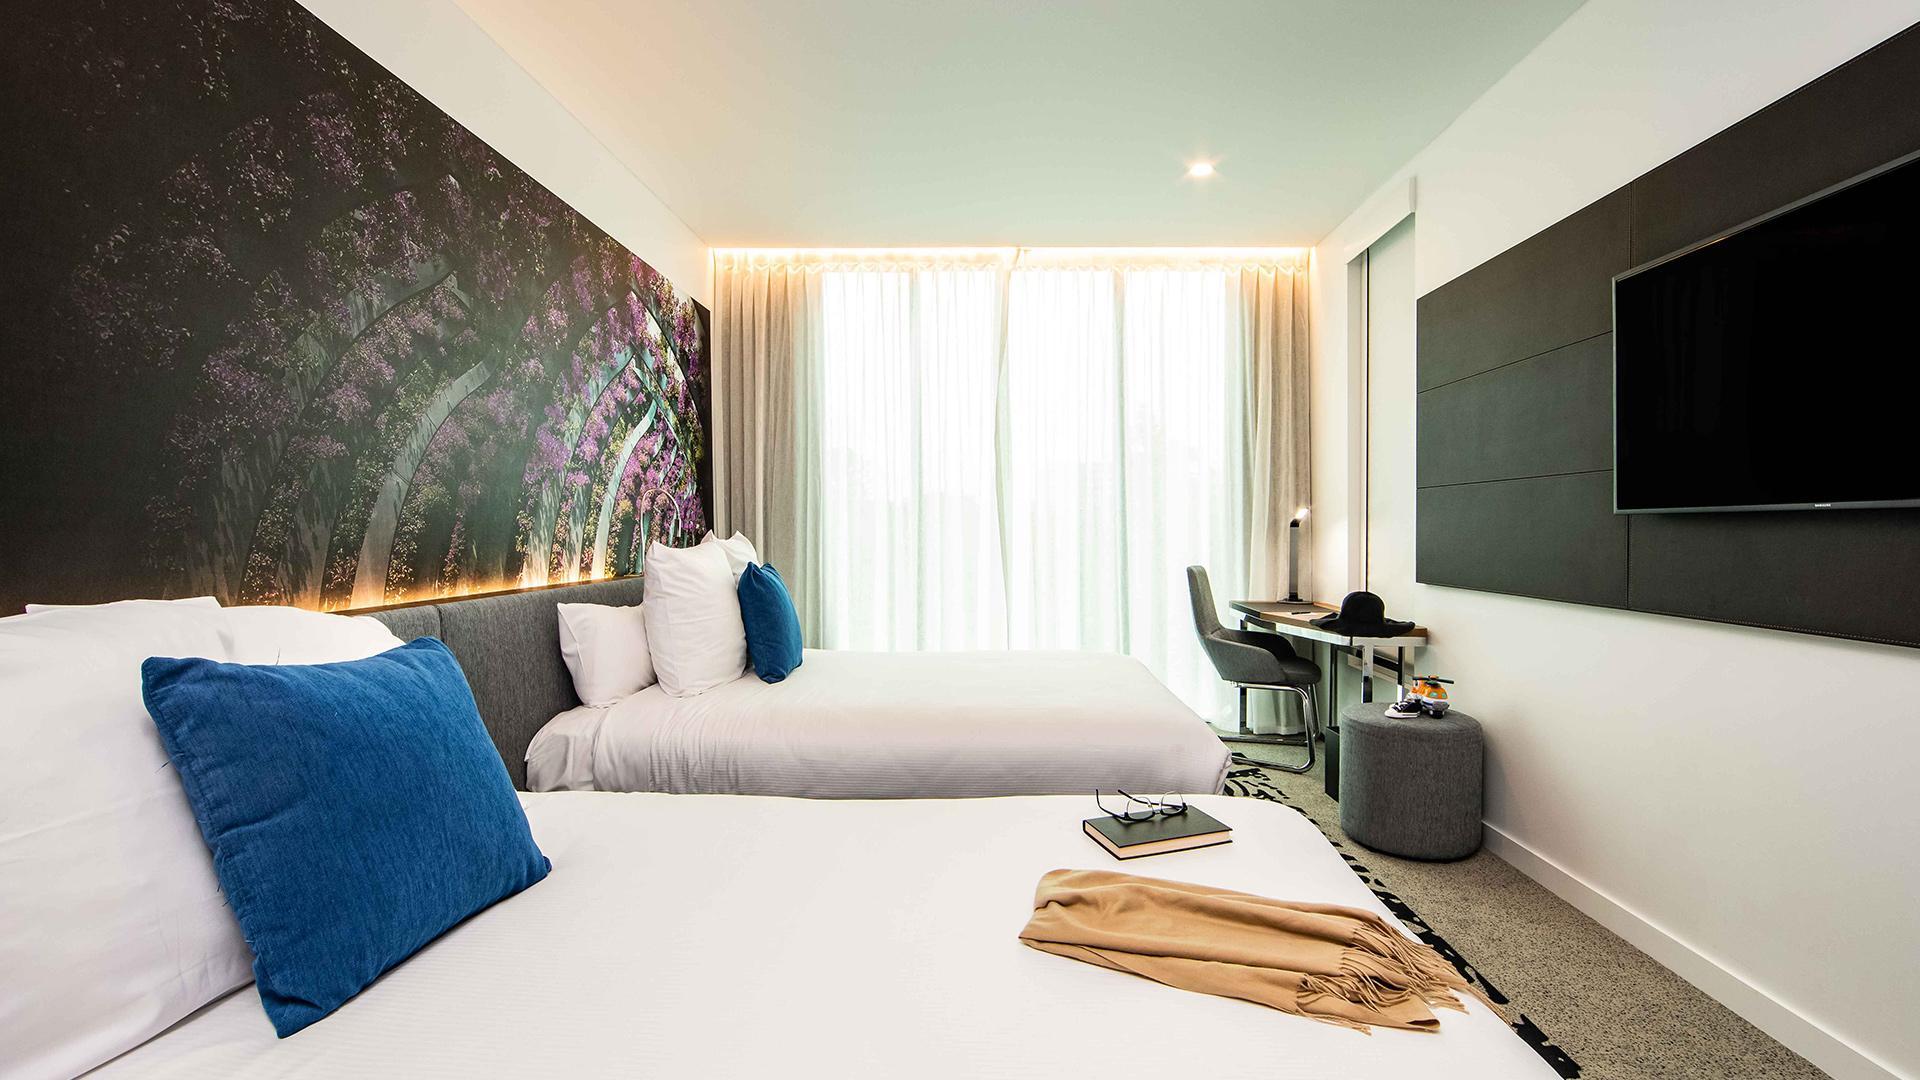 Double 'N' Room image 1 at Novotel Brisbane South Bank by Brisbane City, Queensland, Australia